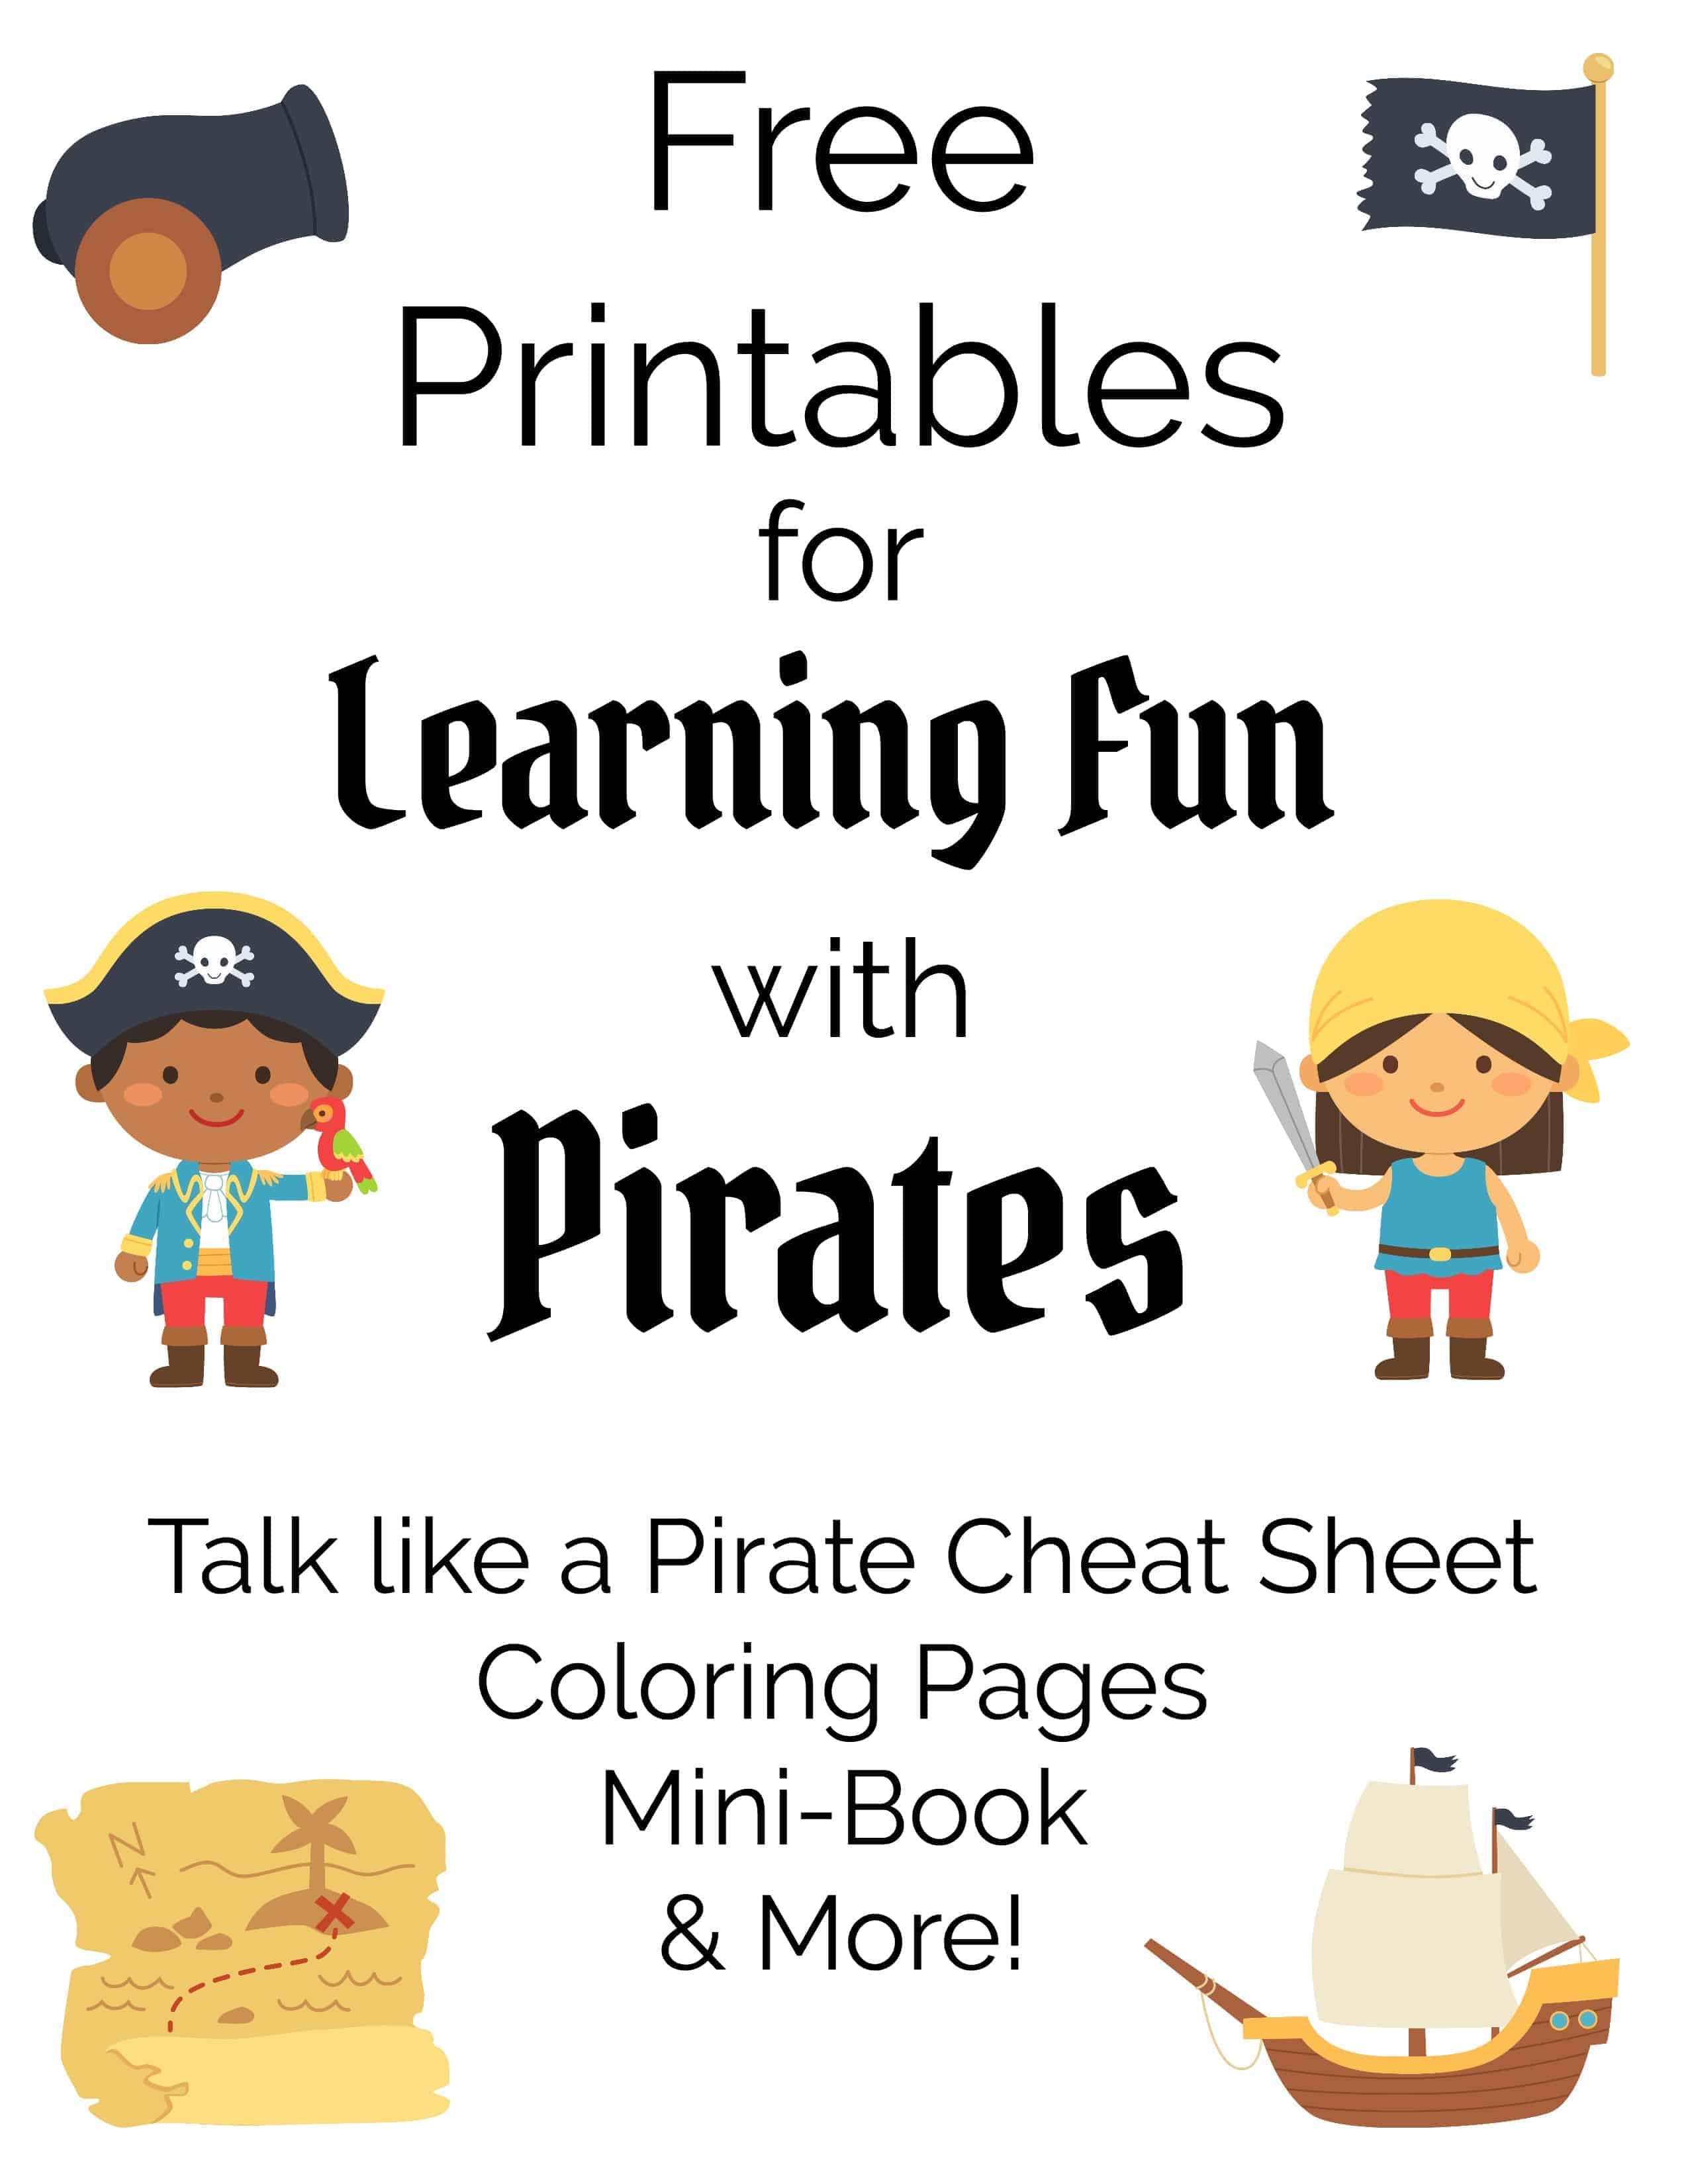 Learning Fun With Pirates